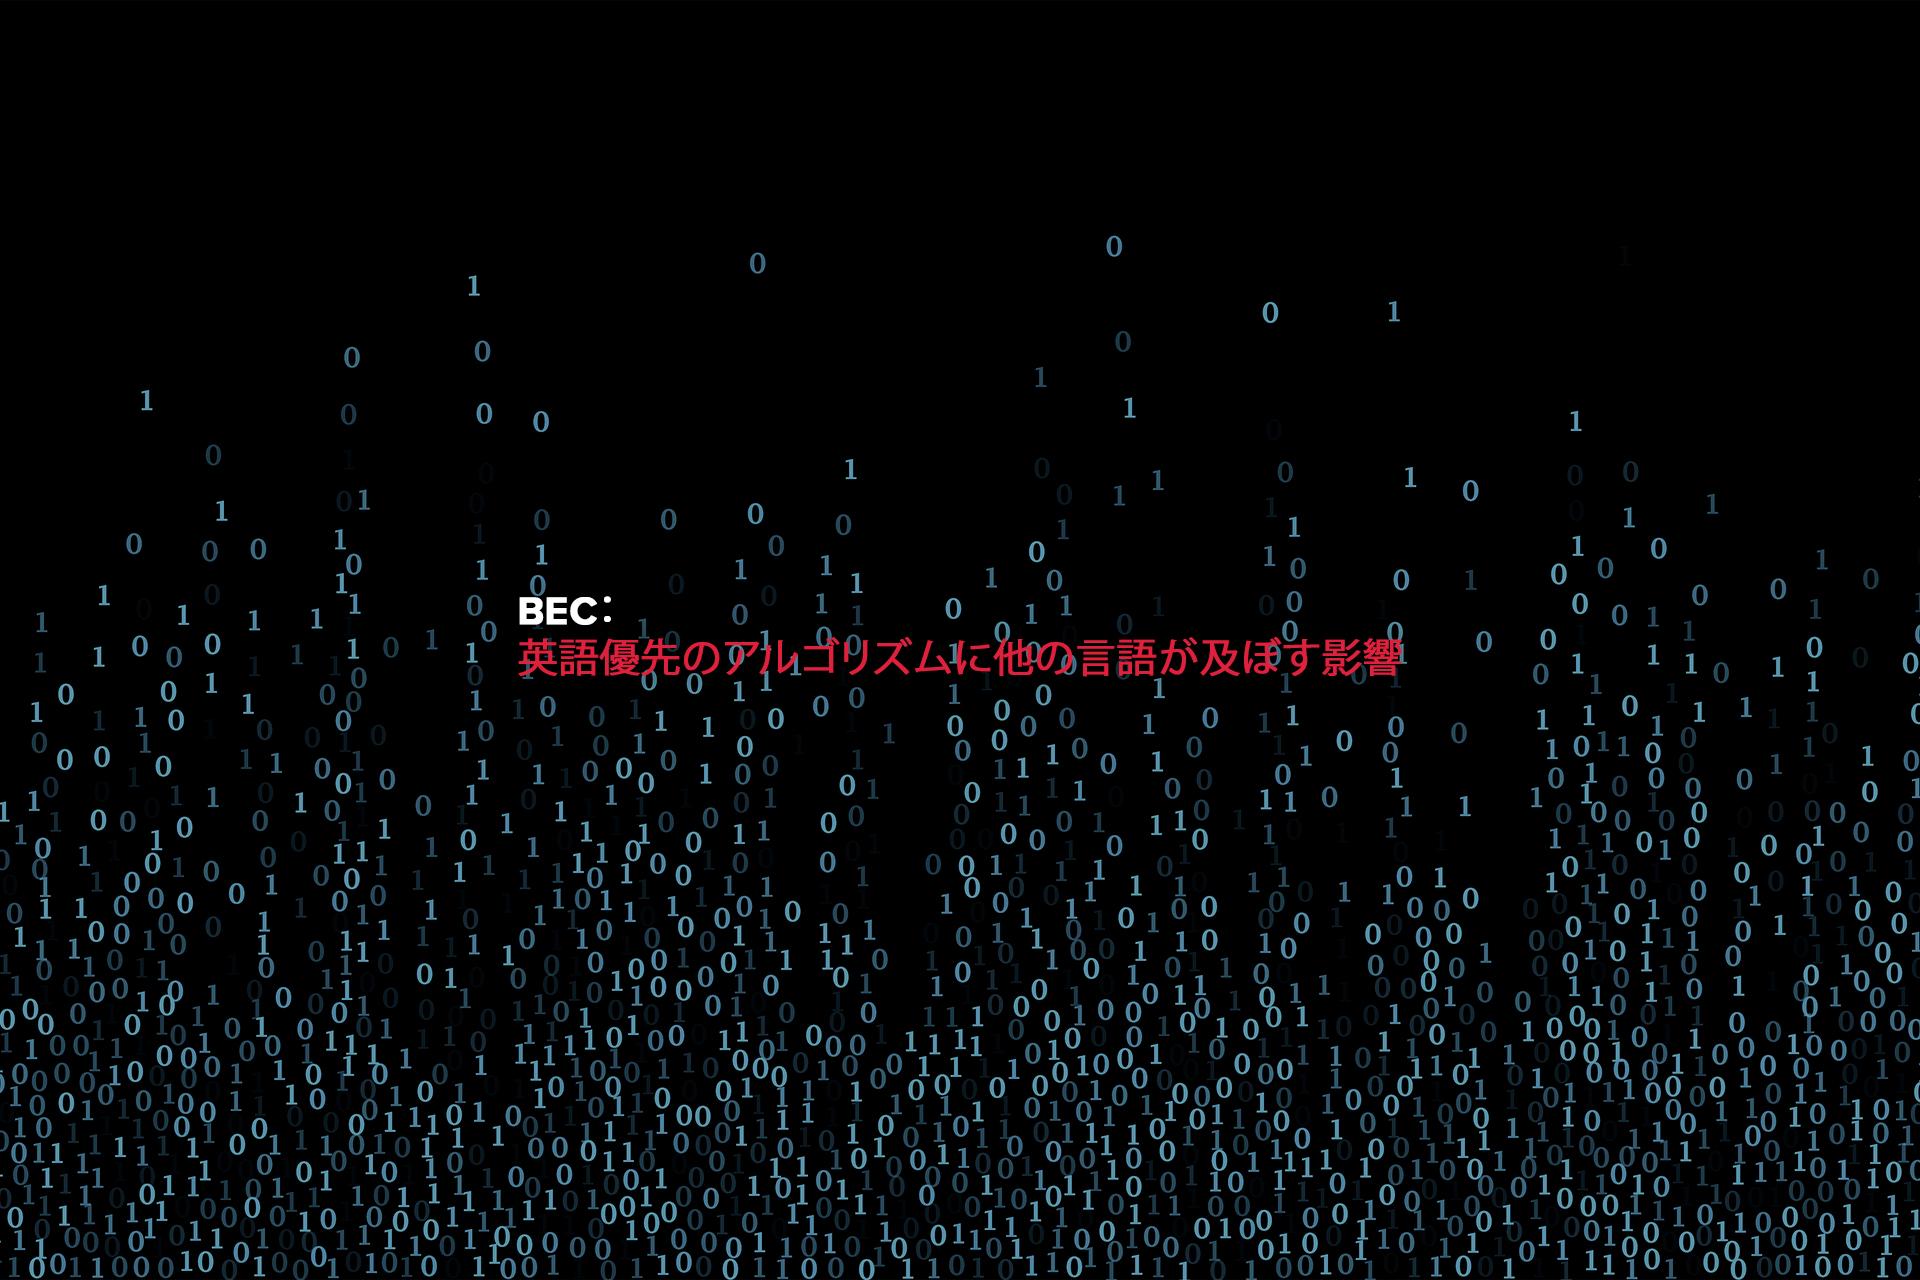 BEC:英語優先のアルゴリズムに他の言語が及ぼす影響